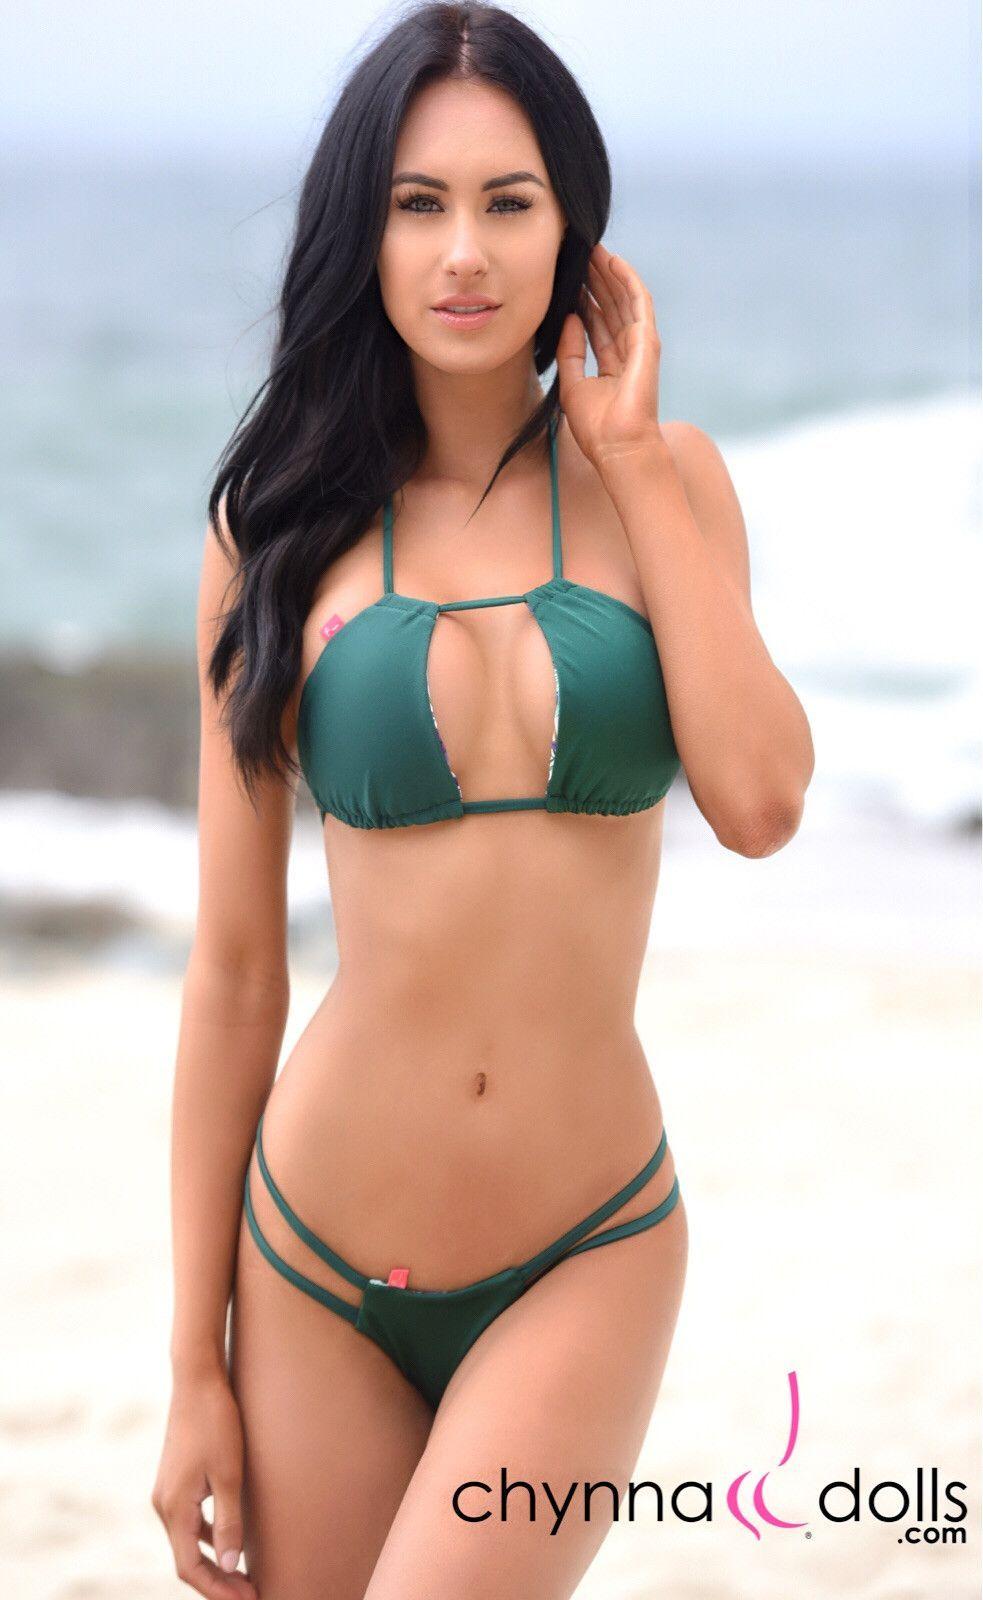 Hot free latino porn sites